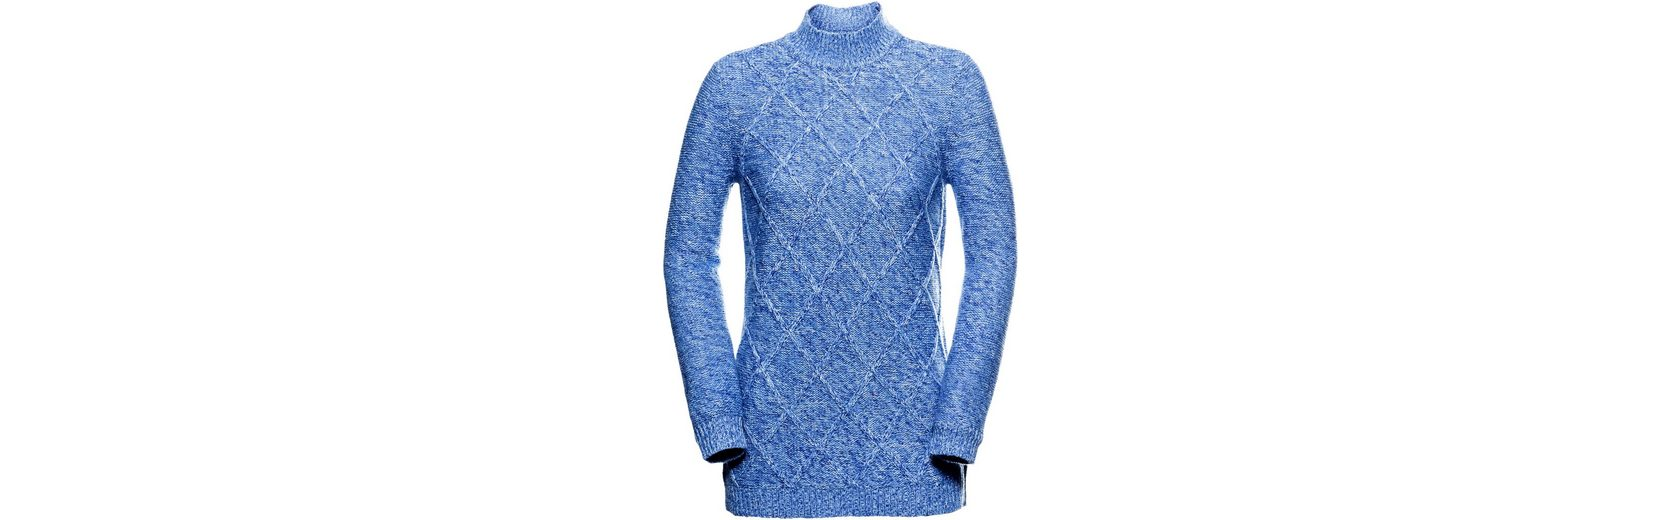 Classic Basics Pullover mit Stehkragen Günstig Kaufen Erstaunlichen Preis Rabatt Aaa Billig Verkauf Rabatt Rabatt zsuMBu2I26